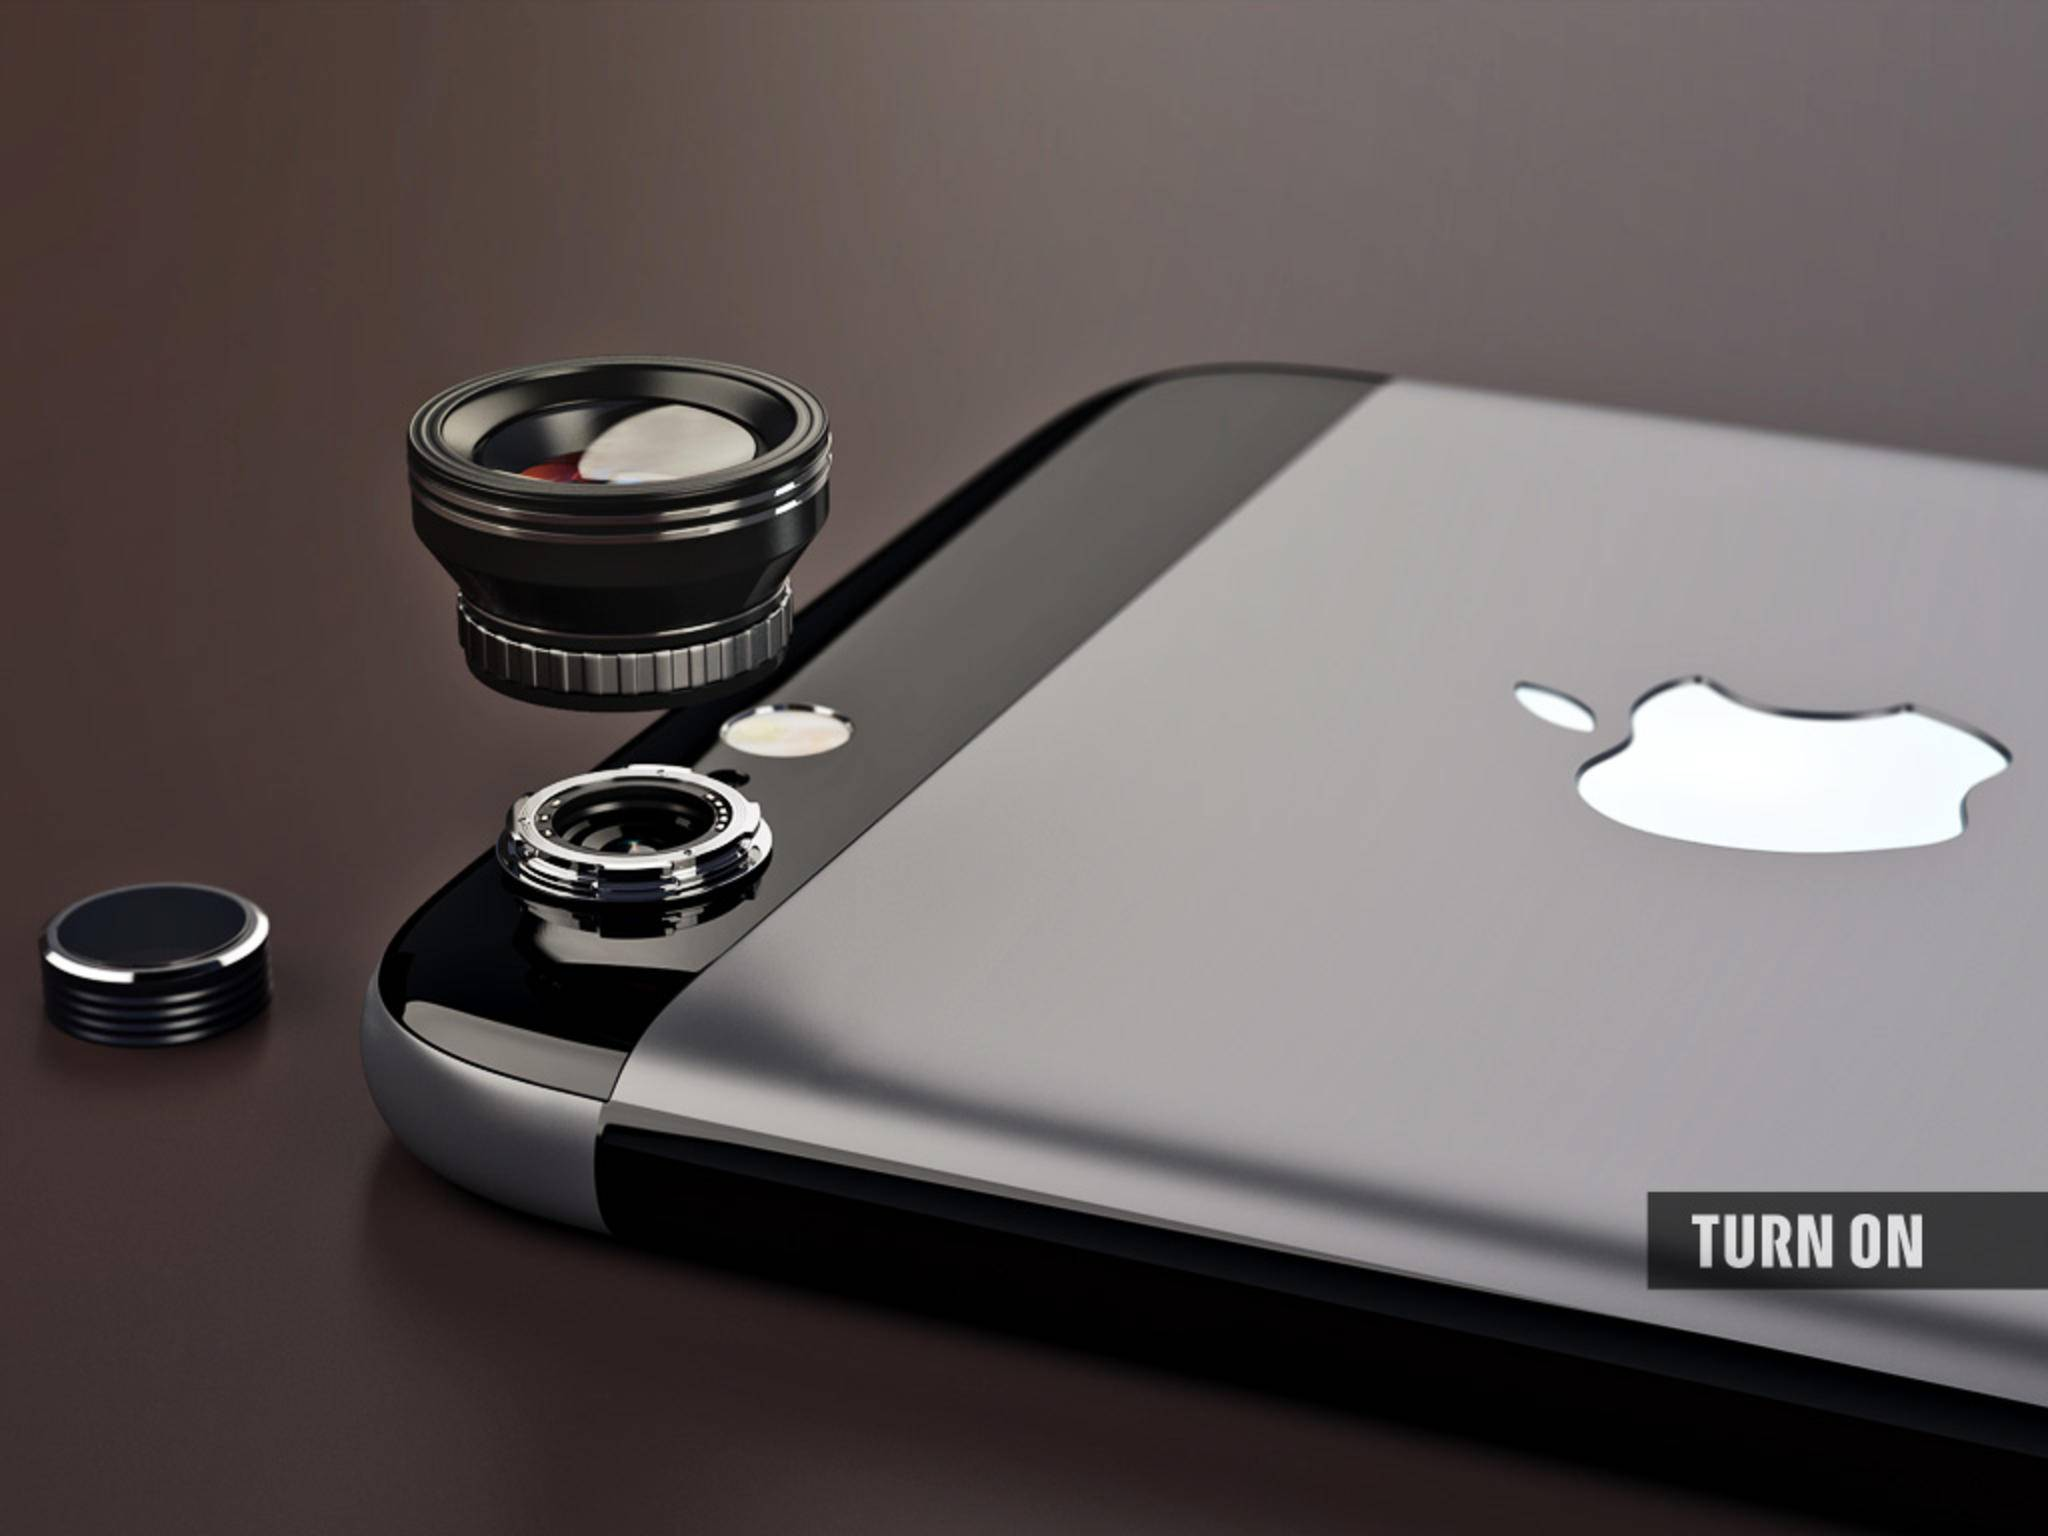 Die Kameralinse unseres des iPhone 7 ist abnehmbar.